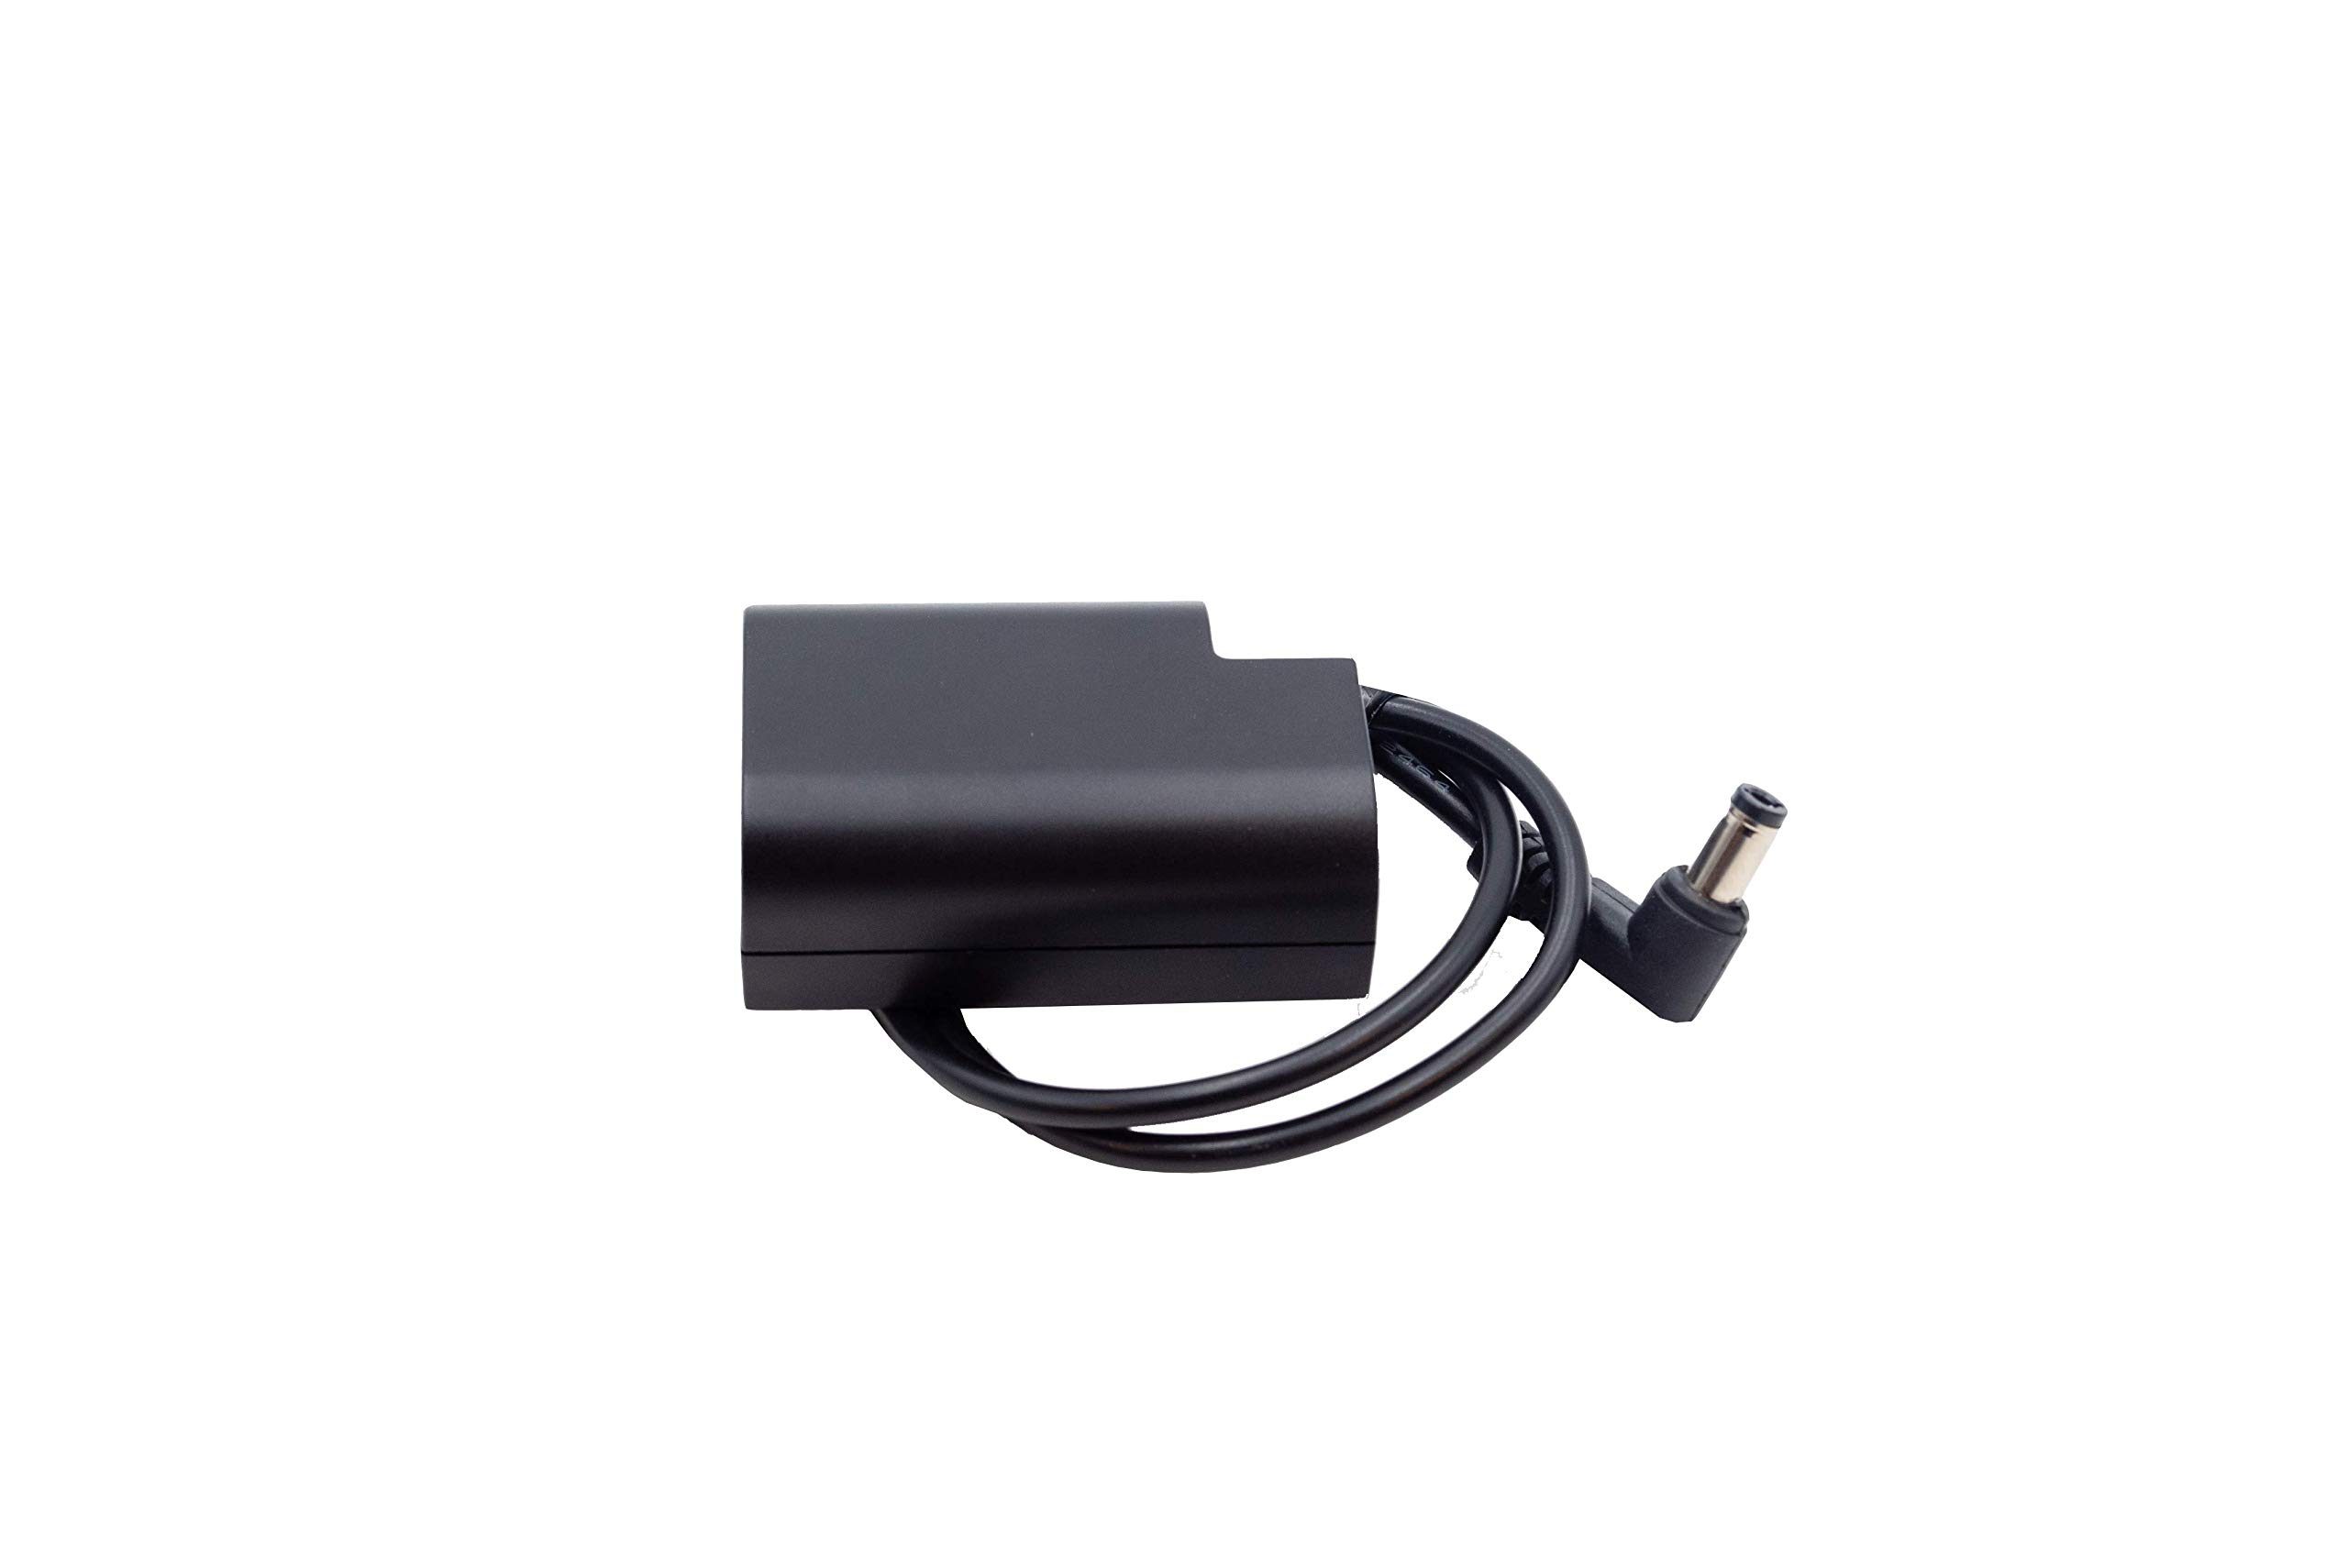 Power Junkie Adapter Panasonic (DMW-BLF19E) Dummy Battery for Panasonic Camera - by Blind Spot